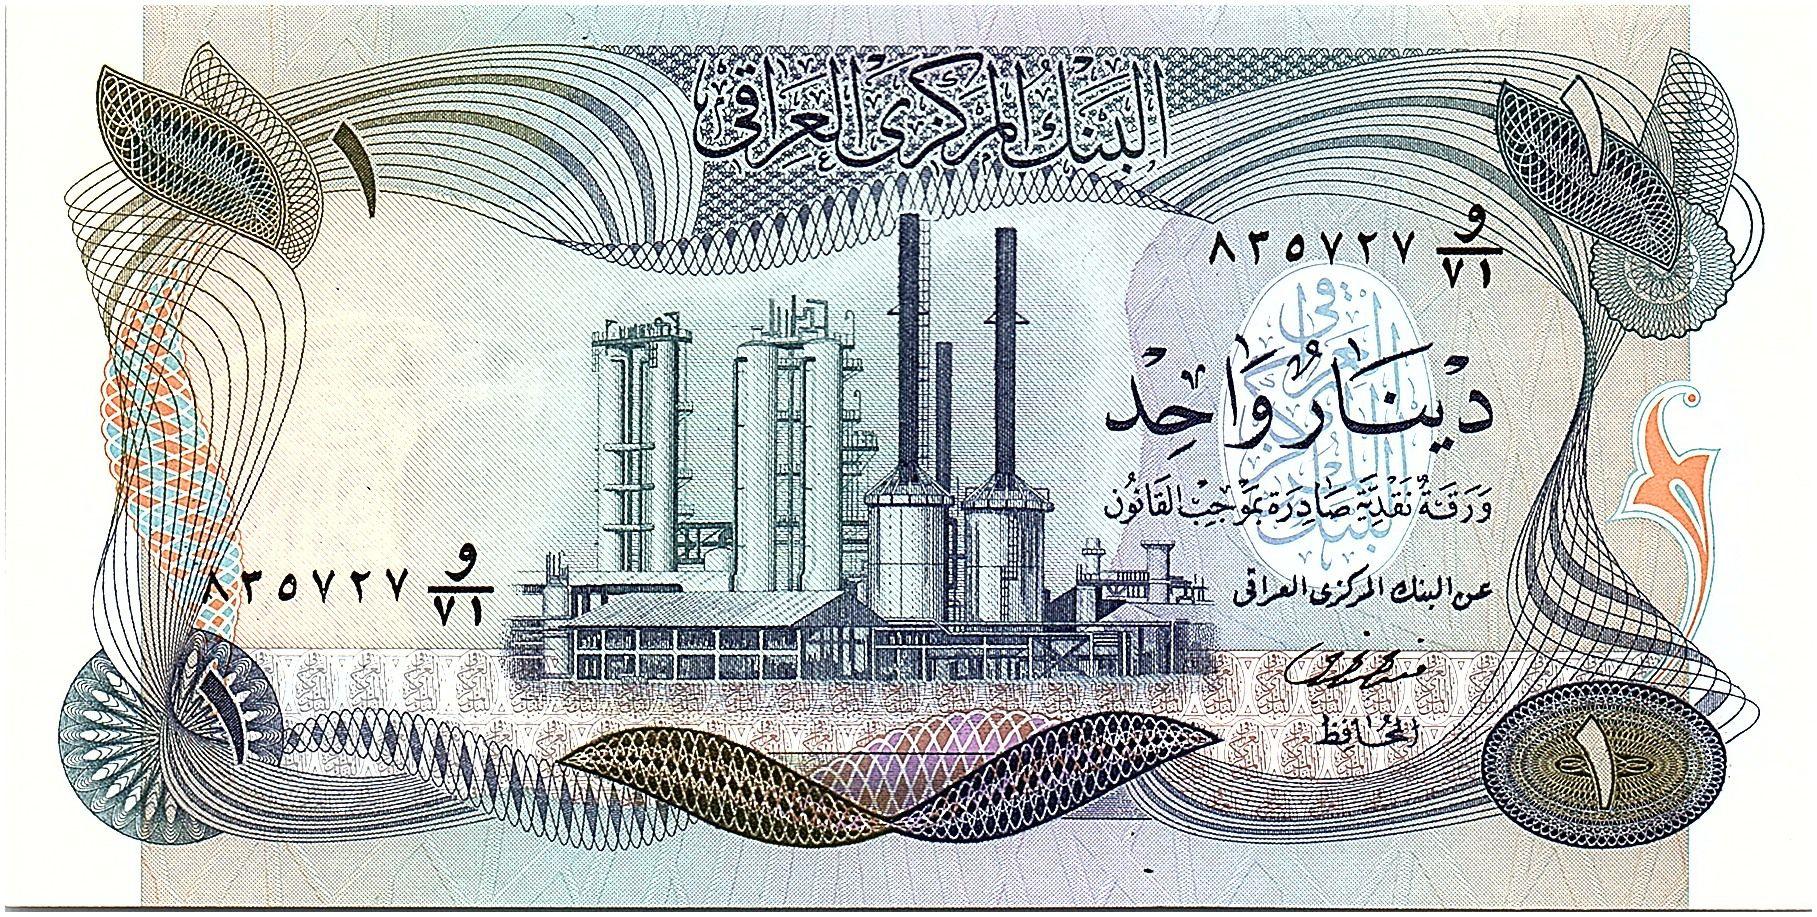 Irak 1 Dinar Raffinerie pétrolière - Porte Ancienne - 1973 - P.63b - Neuf